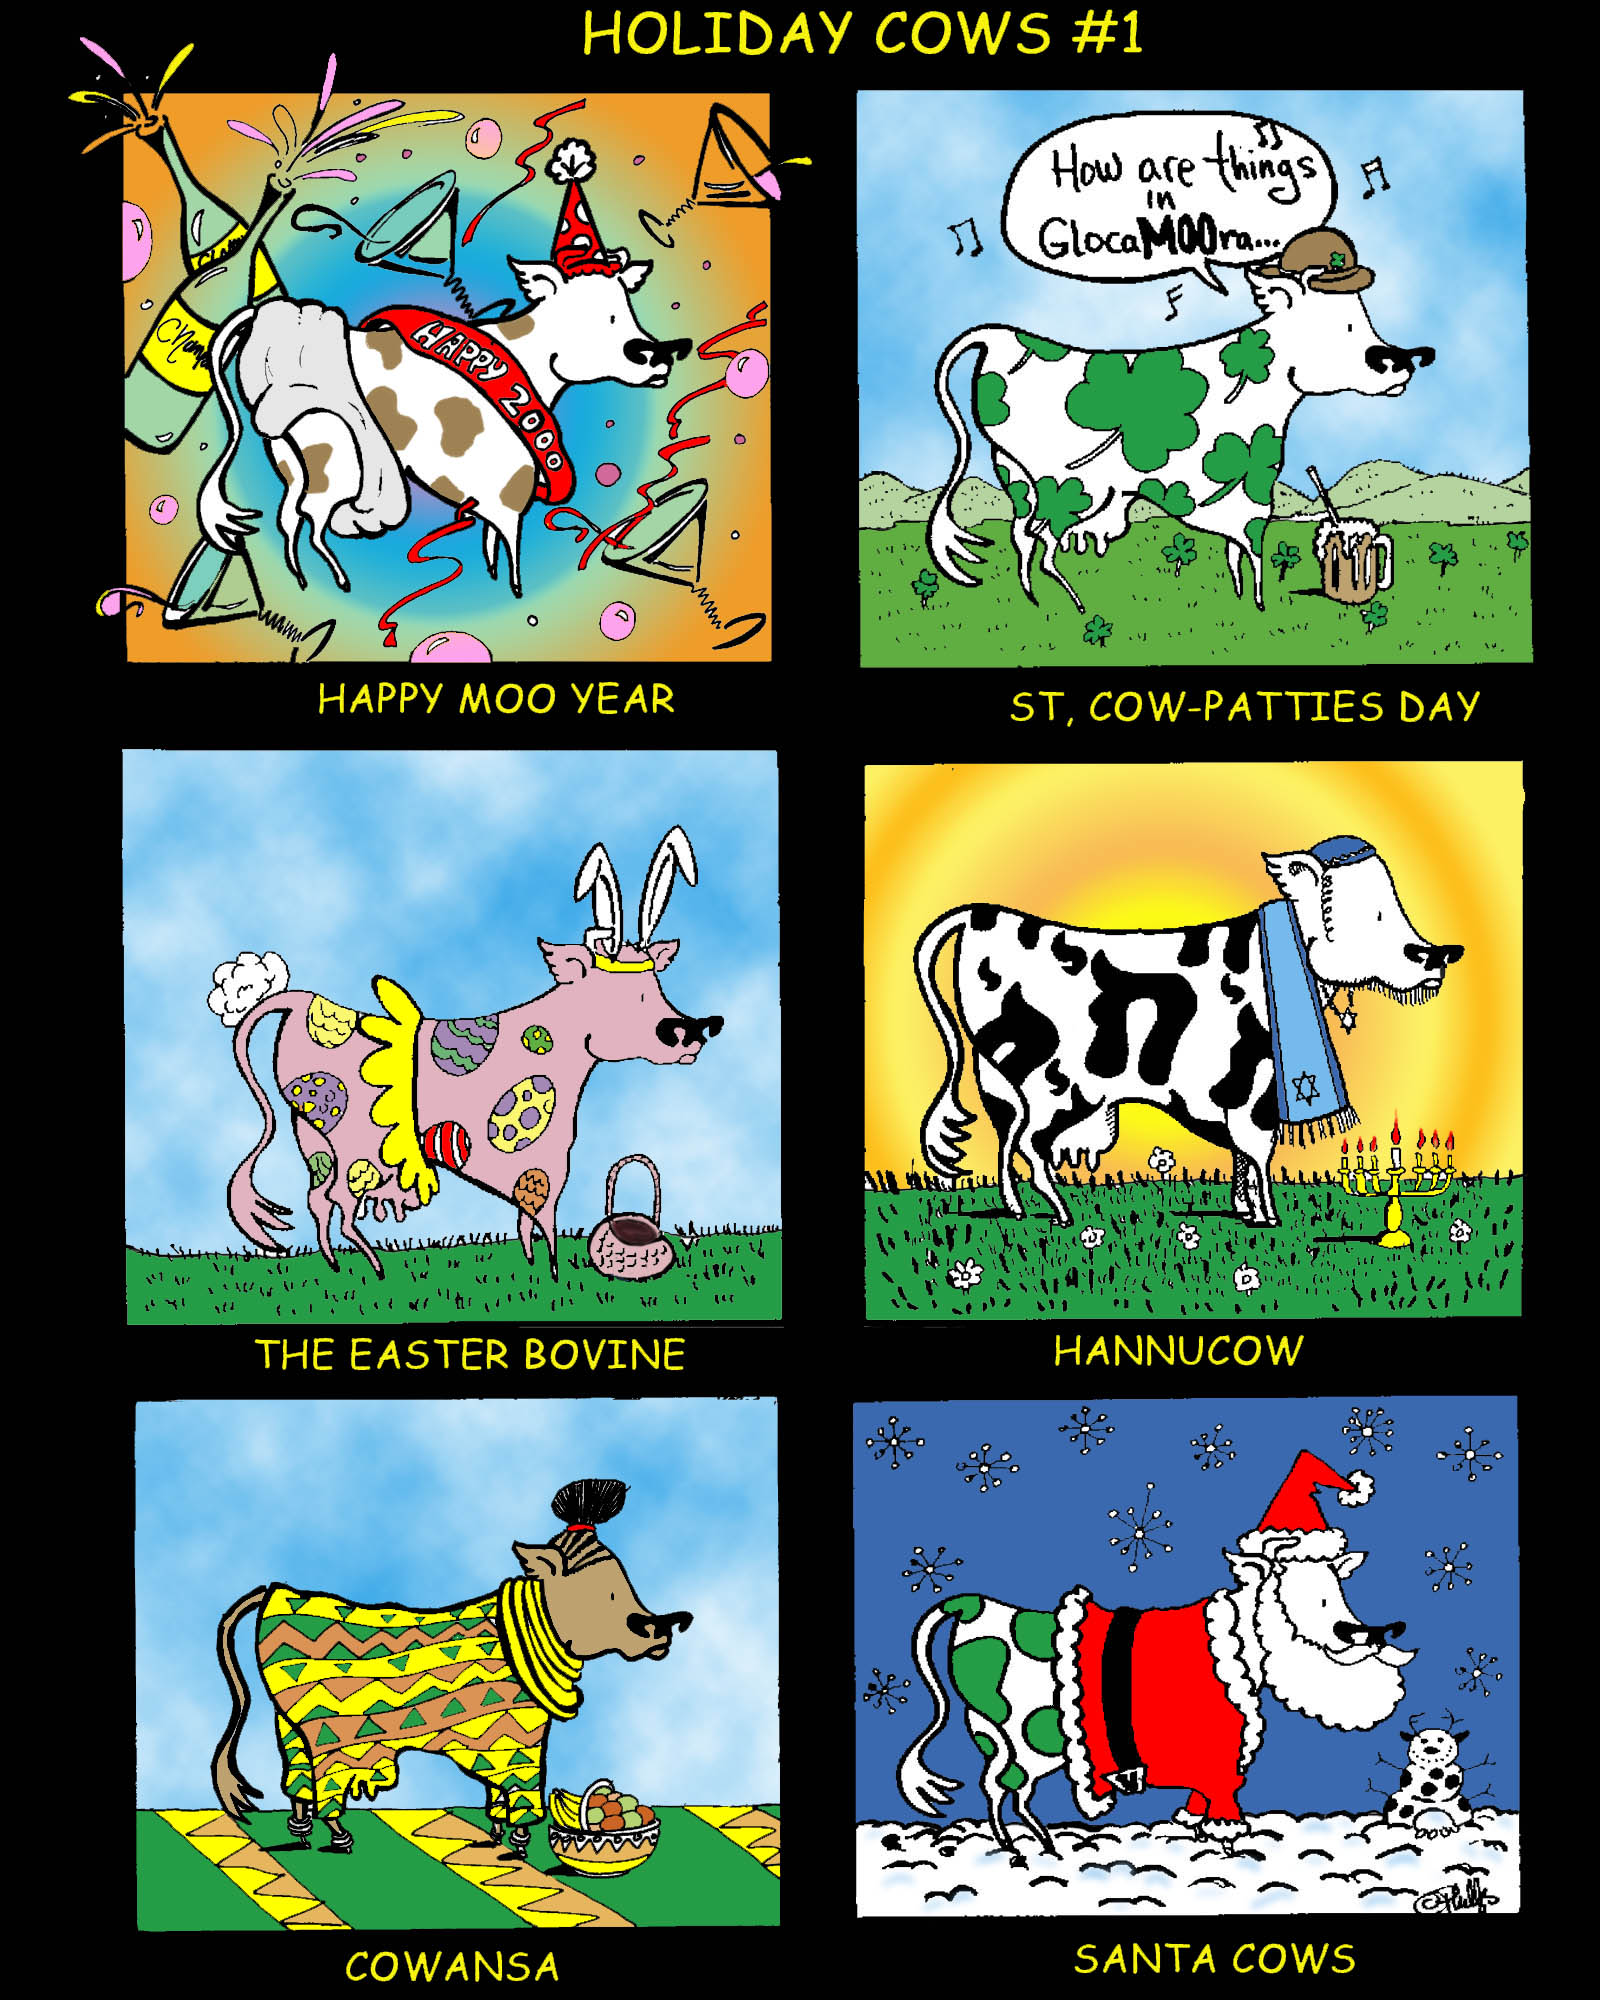 Holiday Cows#1.jpg